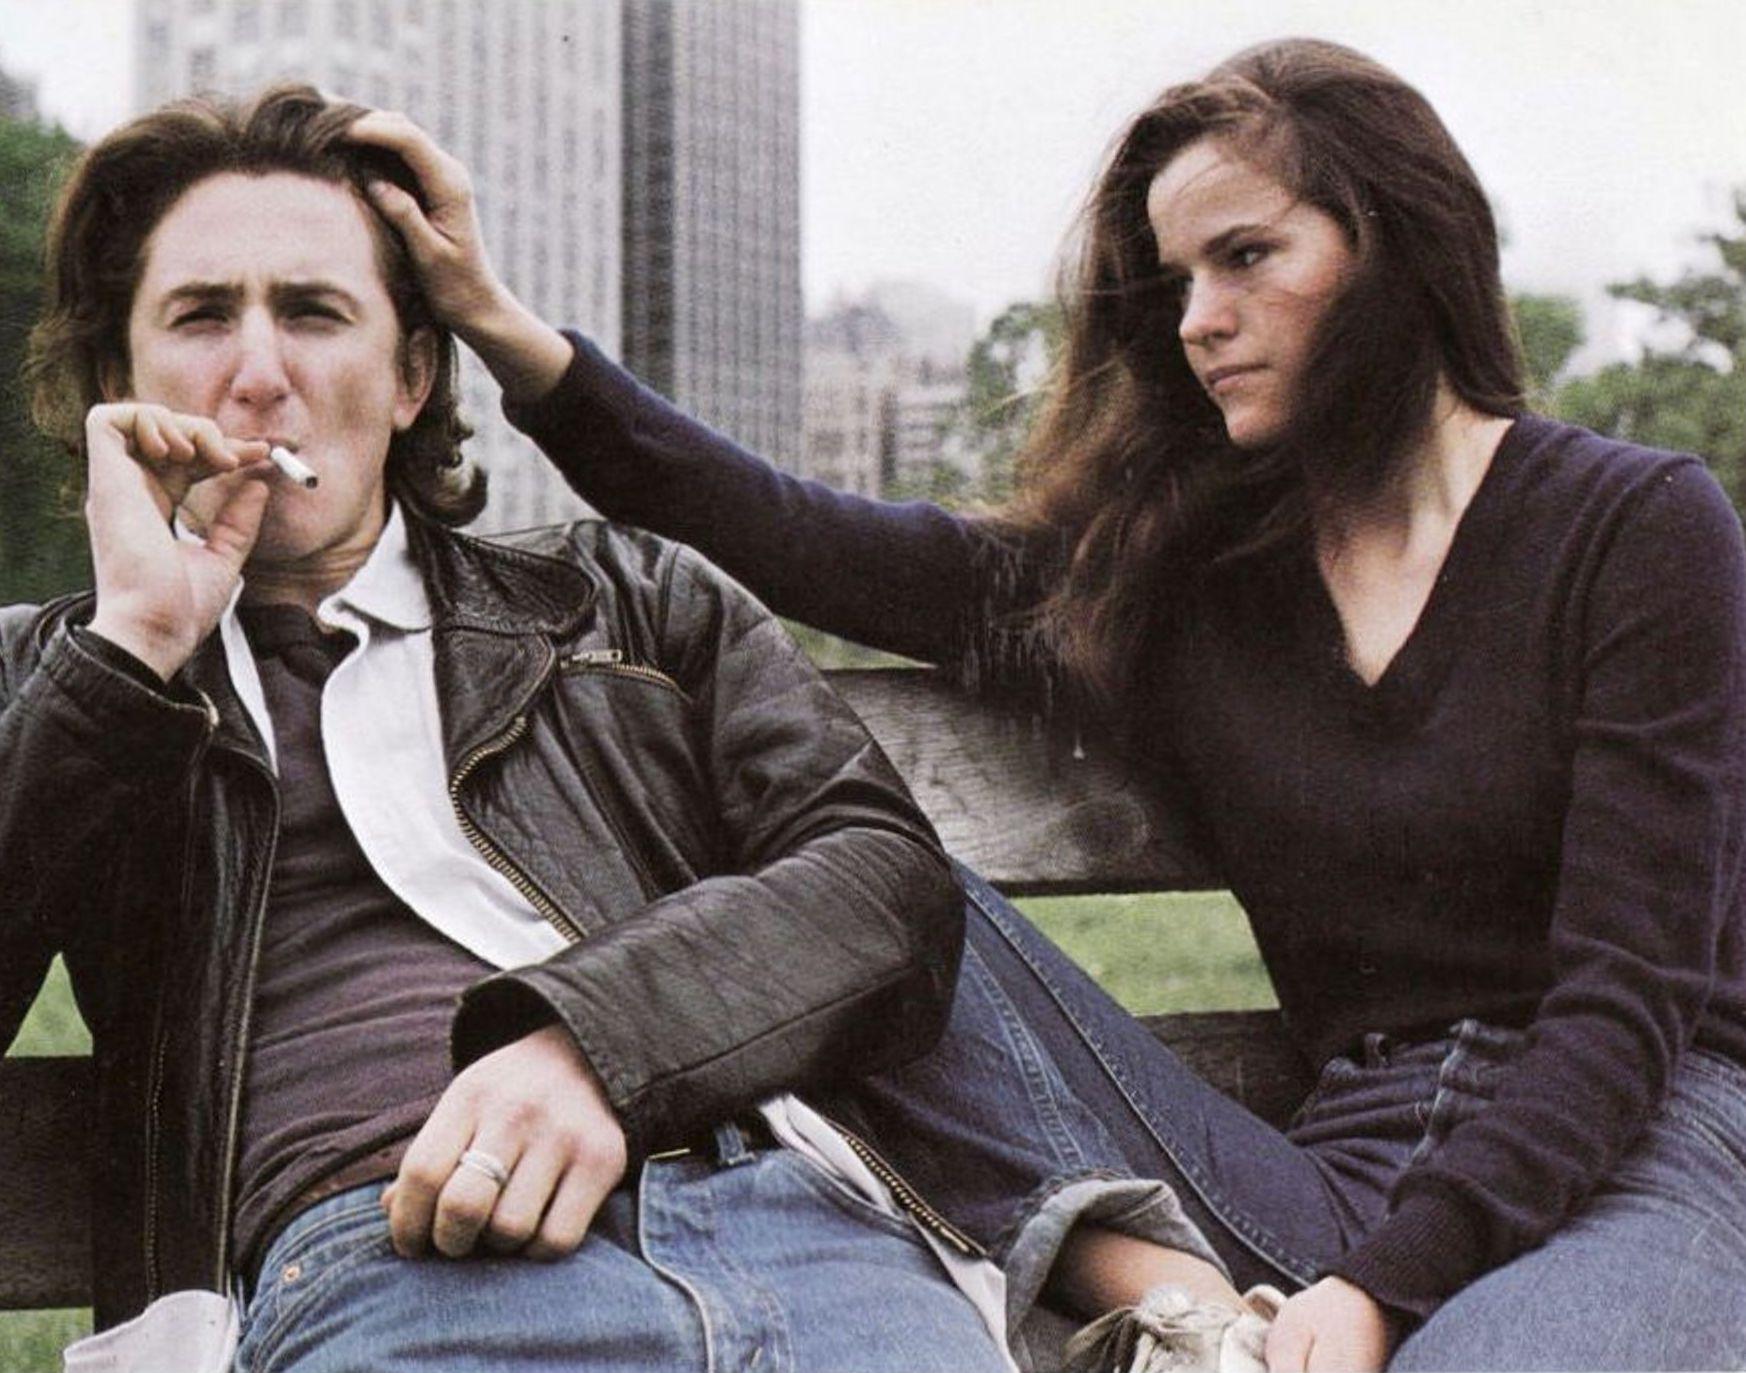 Sean Penn smoking Ally Sheedy Bad Boys (1983)